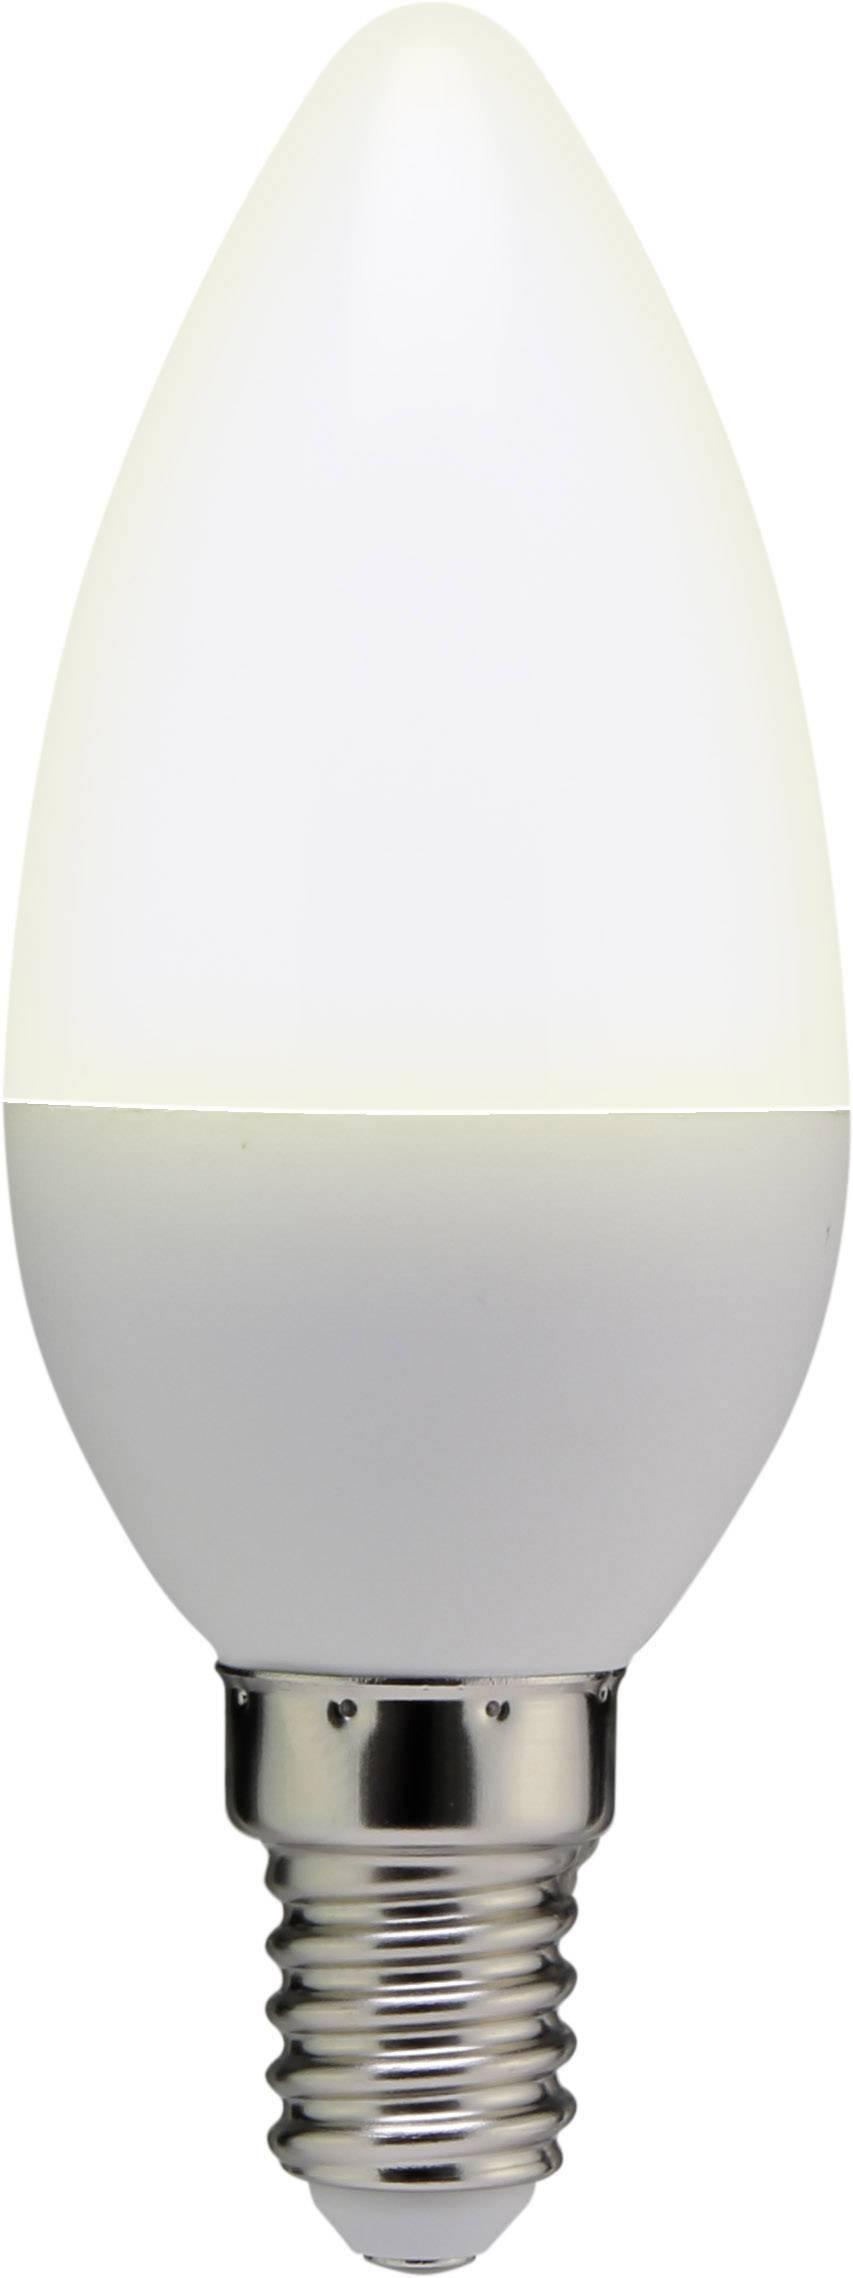 LED Basetech 230 V, E14, 3.5 W = 25 W, 100 mm, teplá bílá, A+ (A++ - E) 1 ks